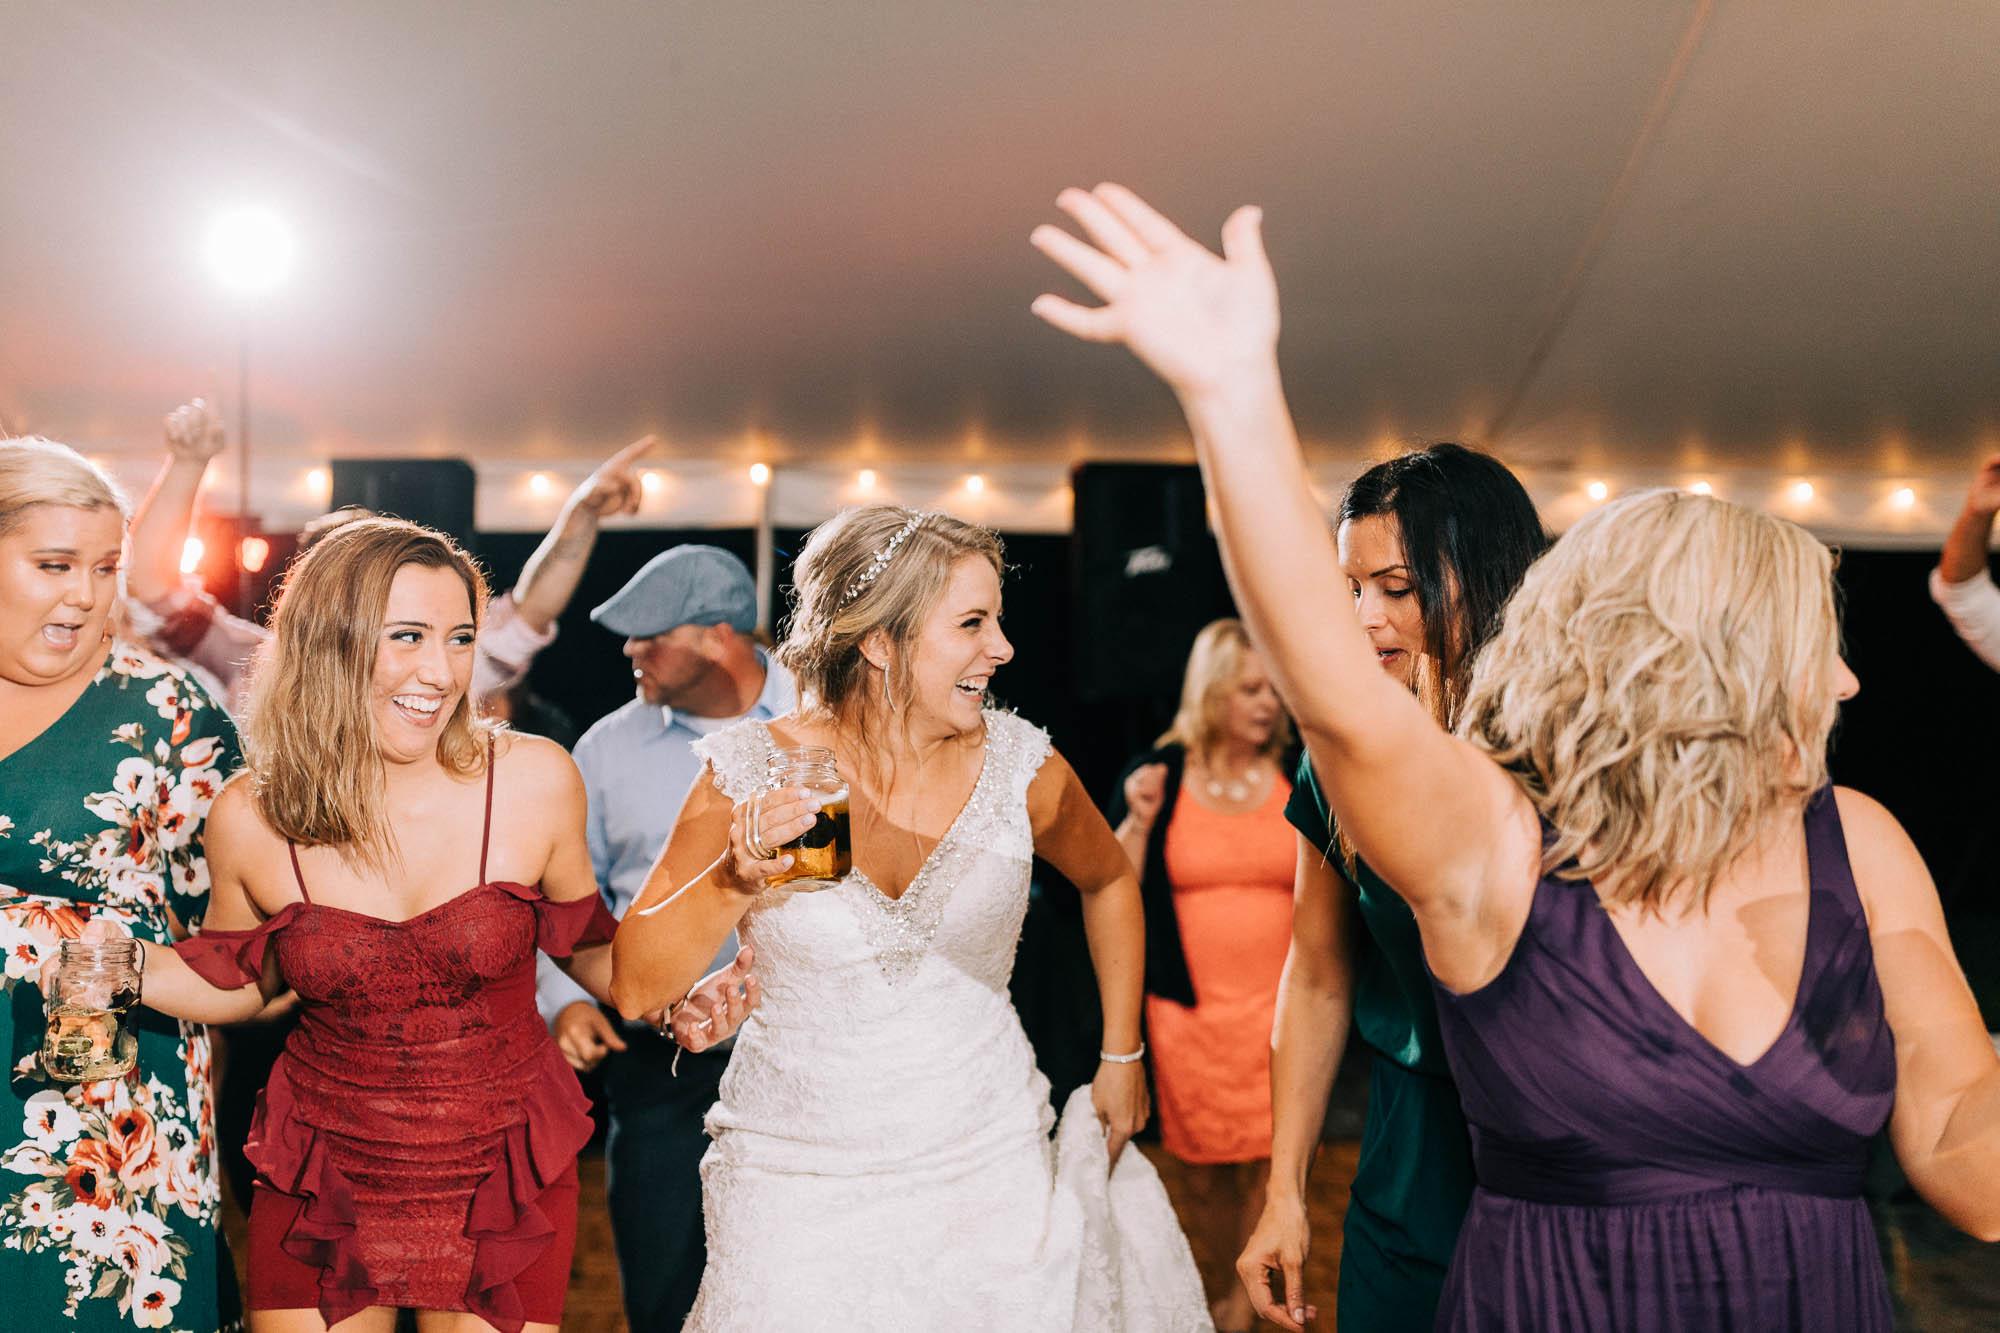 Lodge-at-Raven-Creek-October-wedding-84.jpg